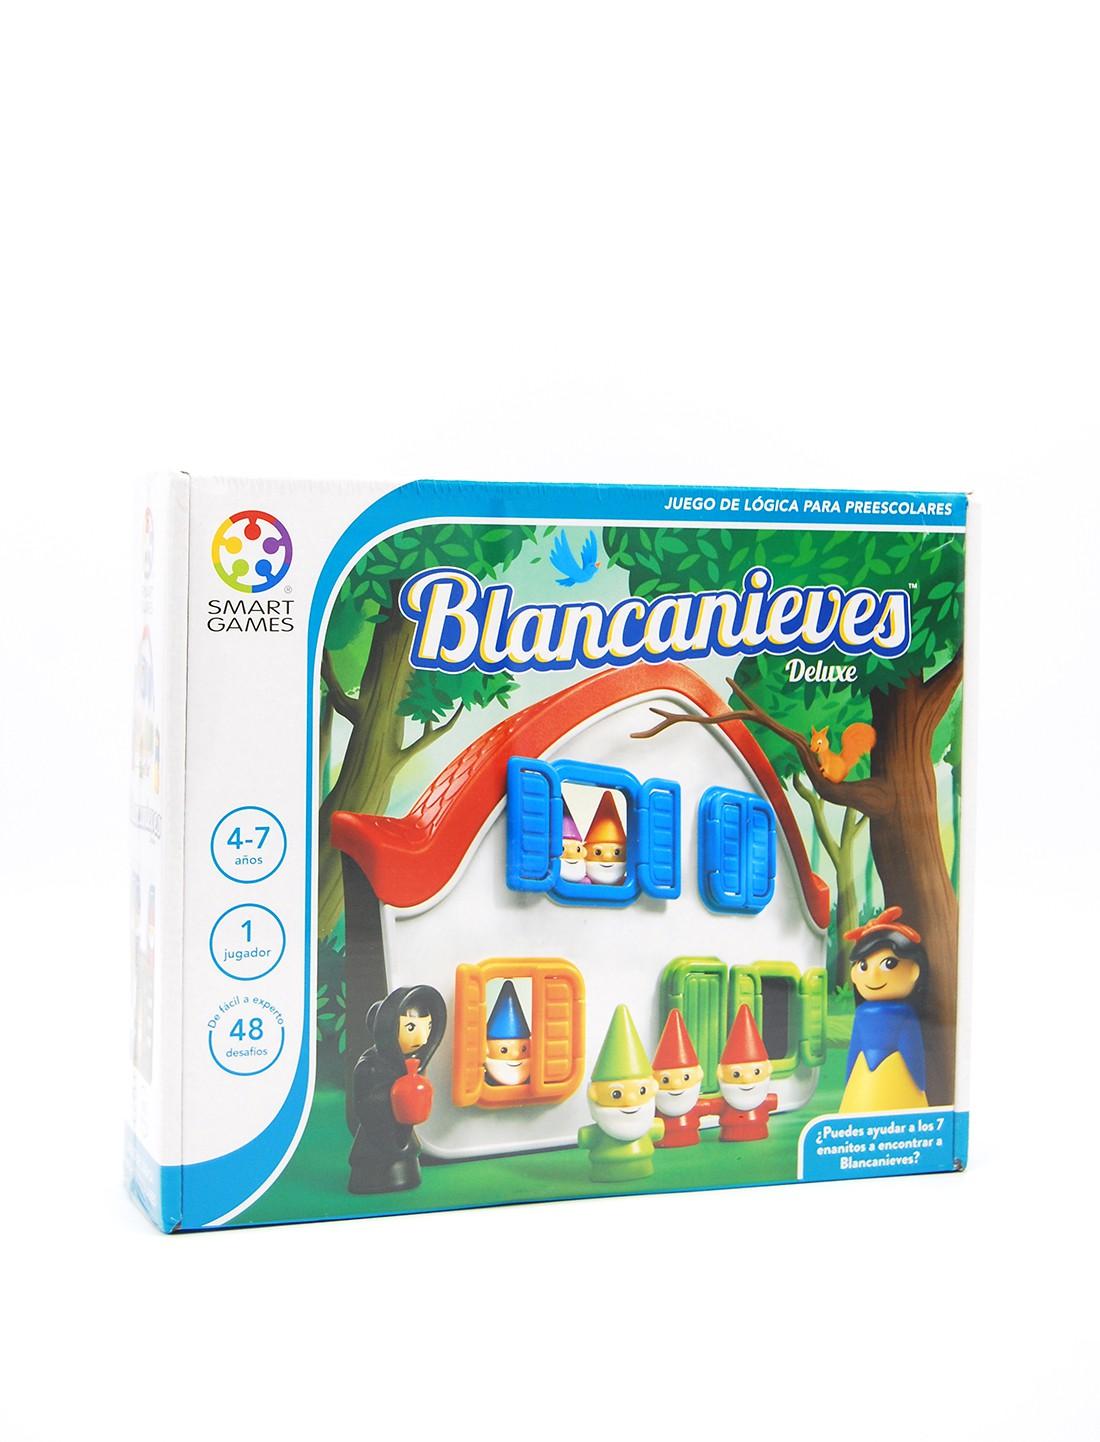 Blancanieves Deluxe. Smart Games